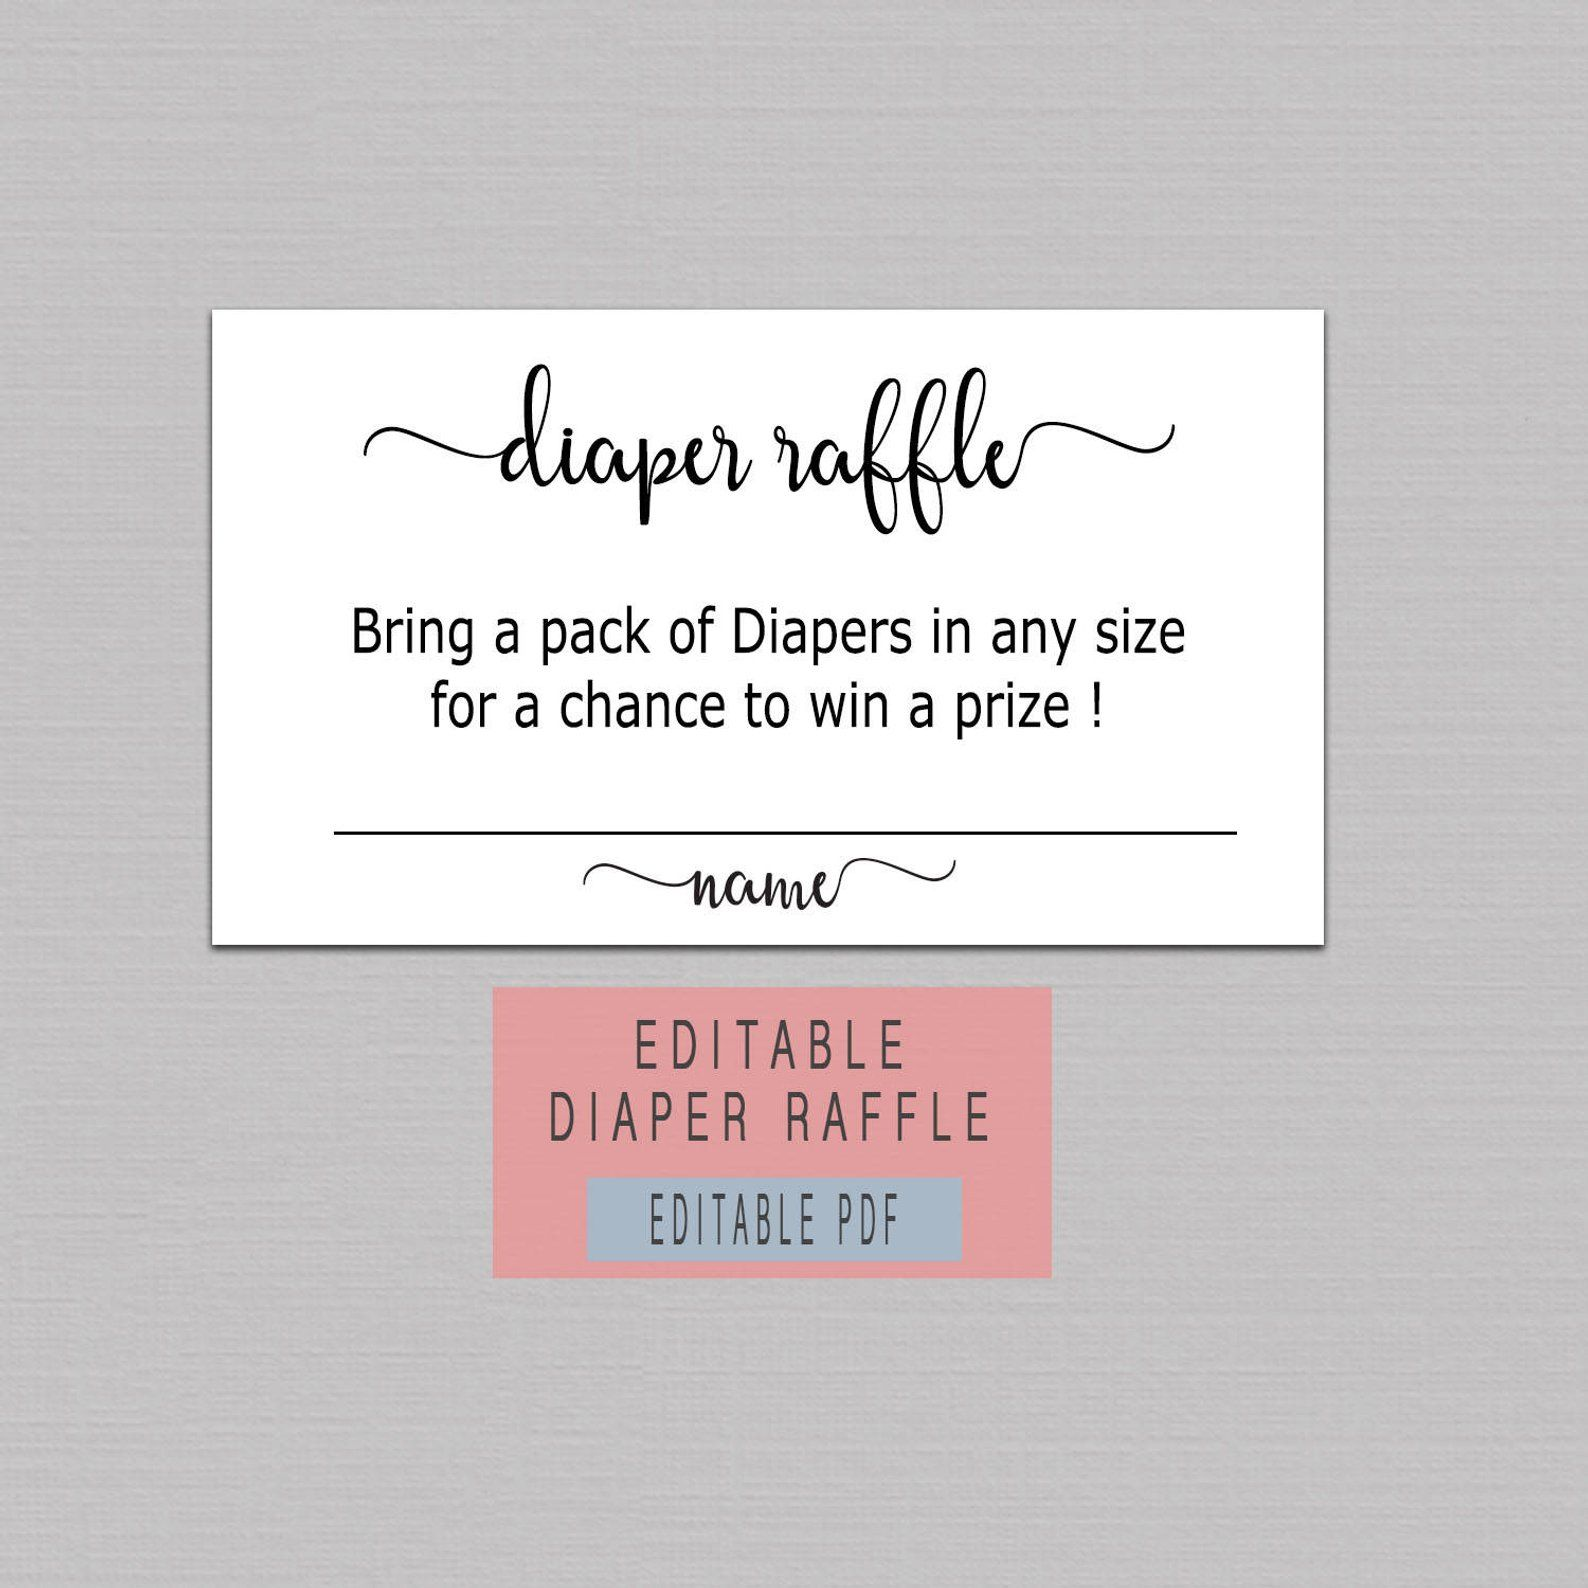 Diaper Raffle Ticket Printable Diaper Raffle Cards Instant Etsy In 2021 Raffle Tickets Printable Diaper Raffle Diaper Raffle Ticket Printable Free diaper raffle ticket template